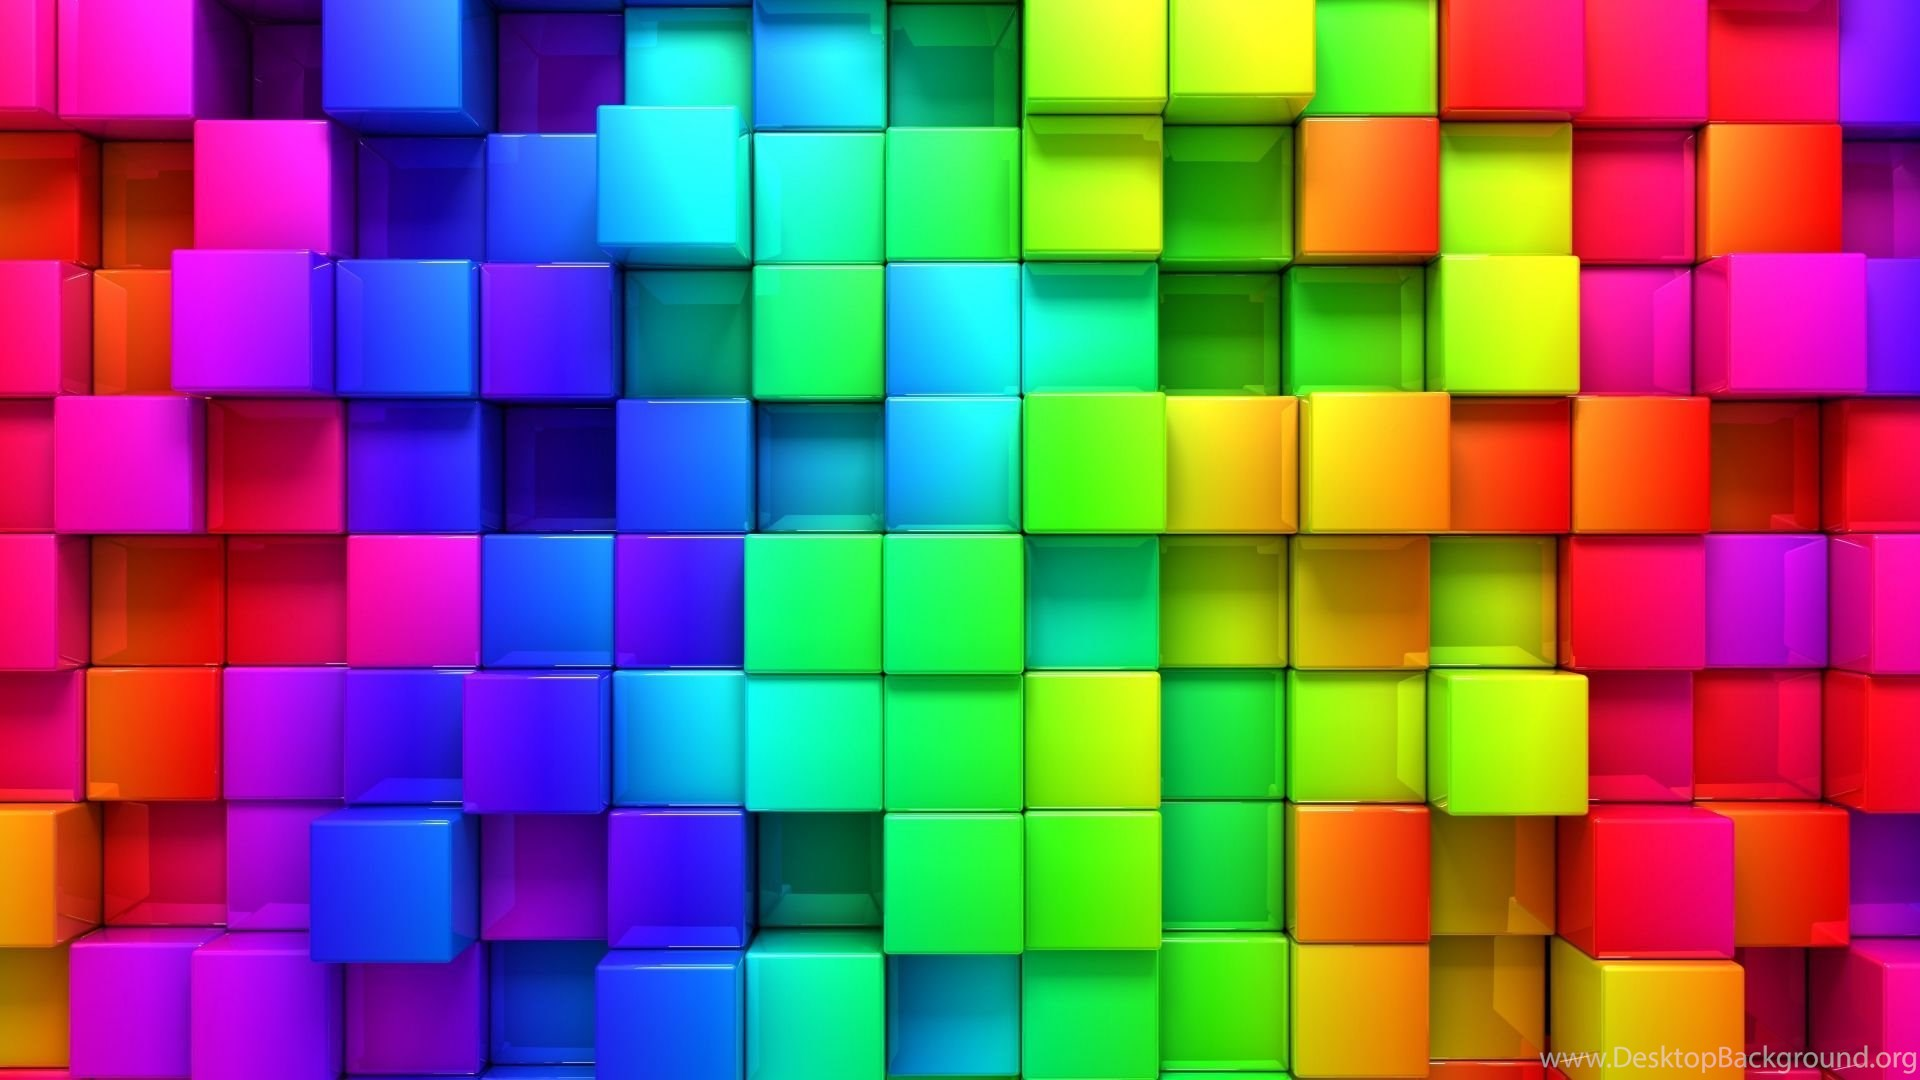 Full Hd 1080p Desktop Wallpapers Hd 1920x1080 Free Desktop Desktop Background